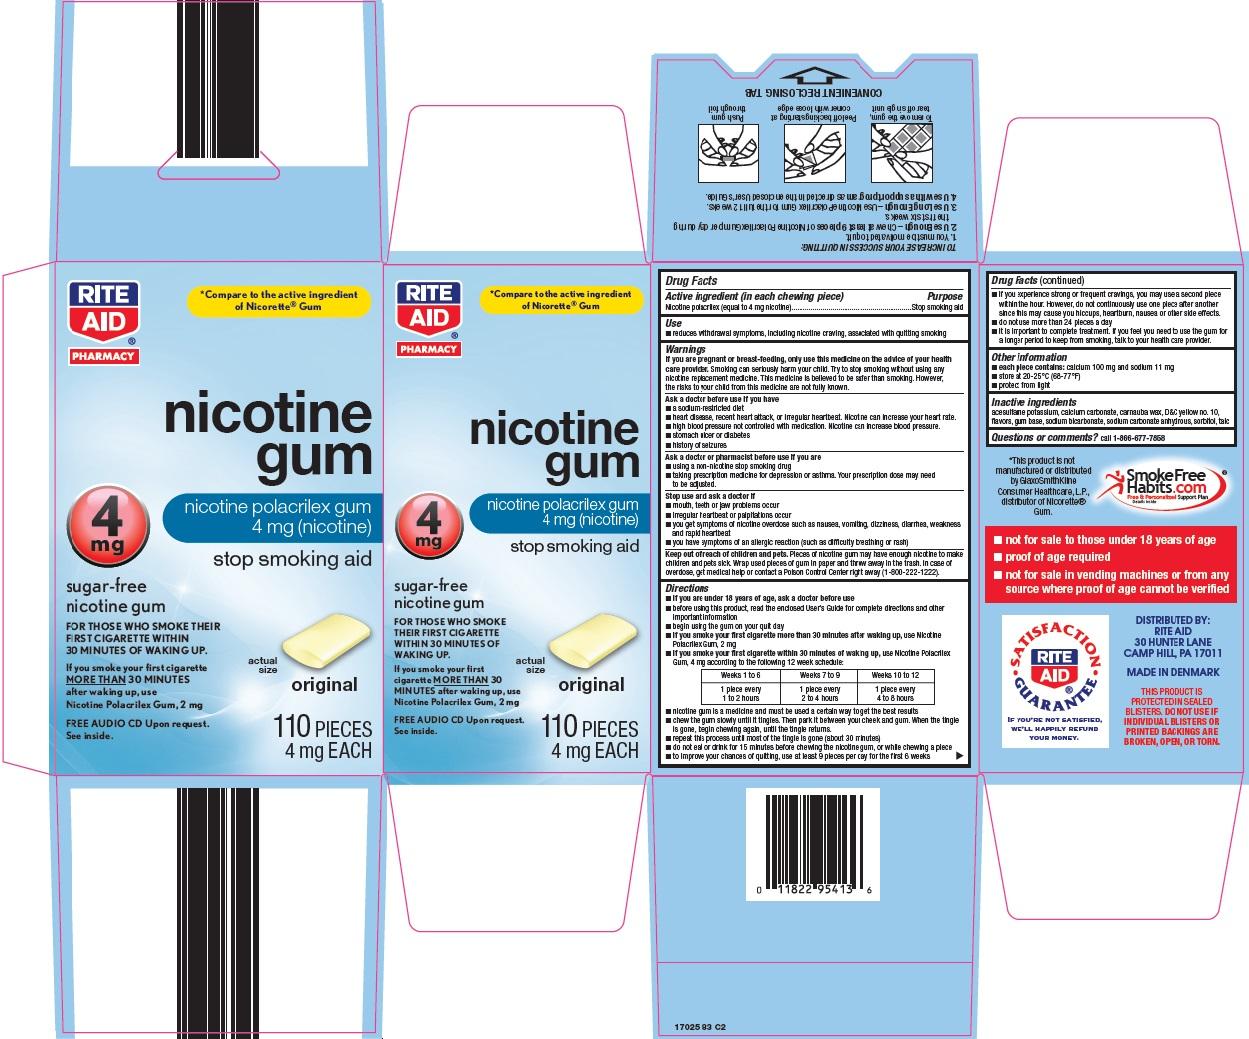 nicotine gum image